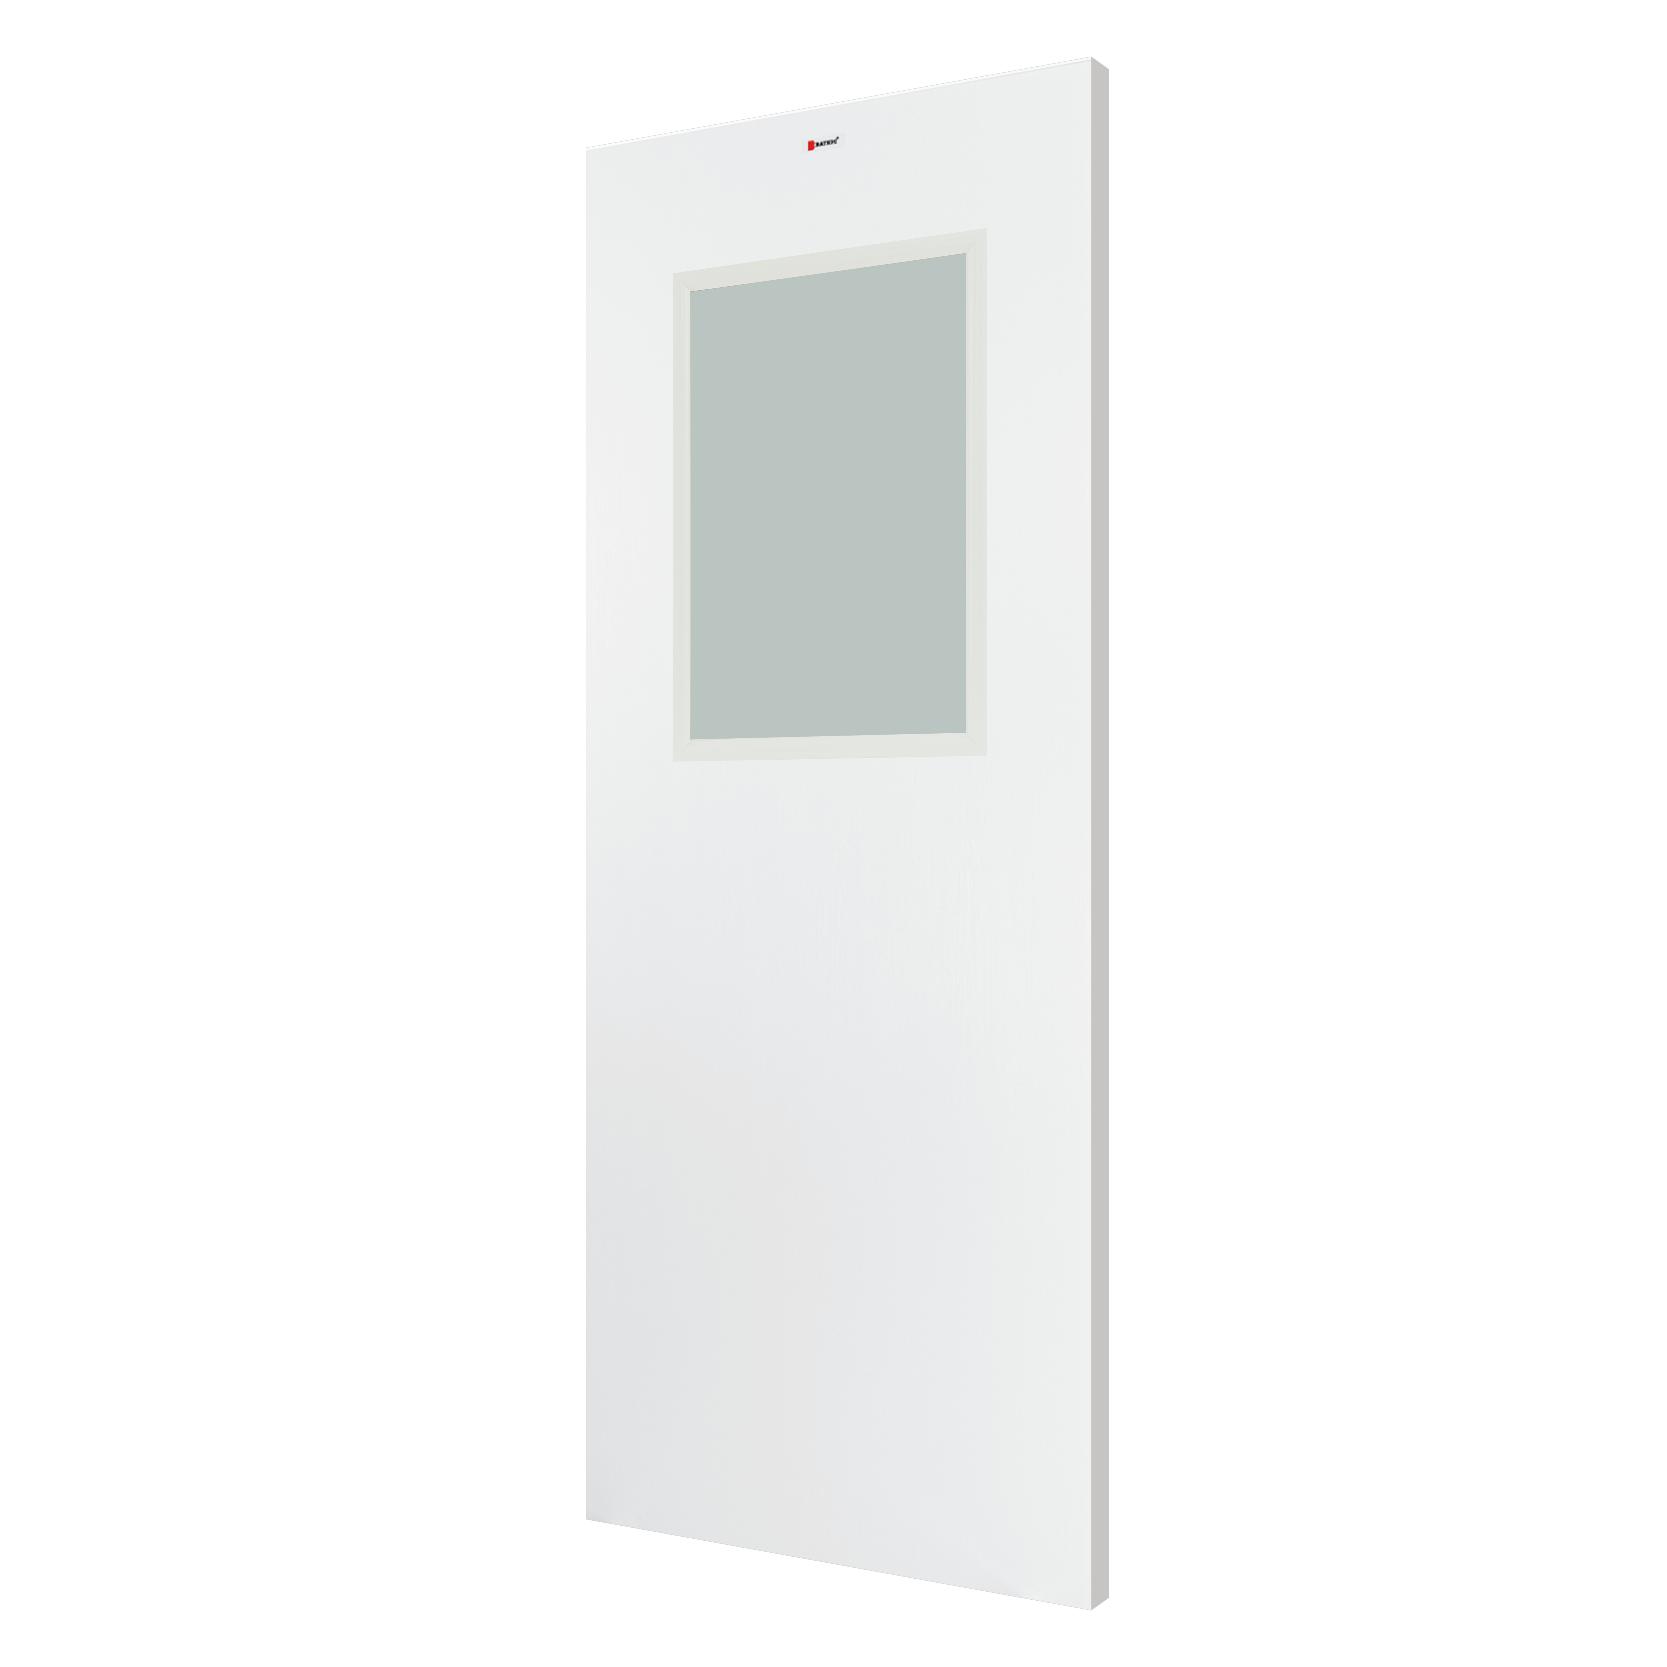 door-wpc-bathic-bwg03-grainwhite-2